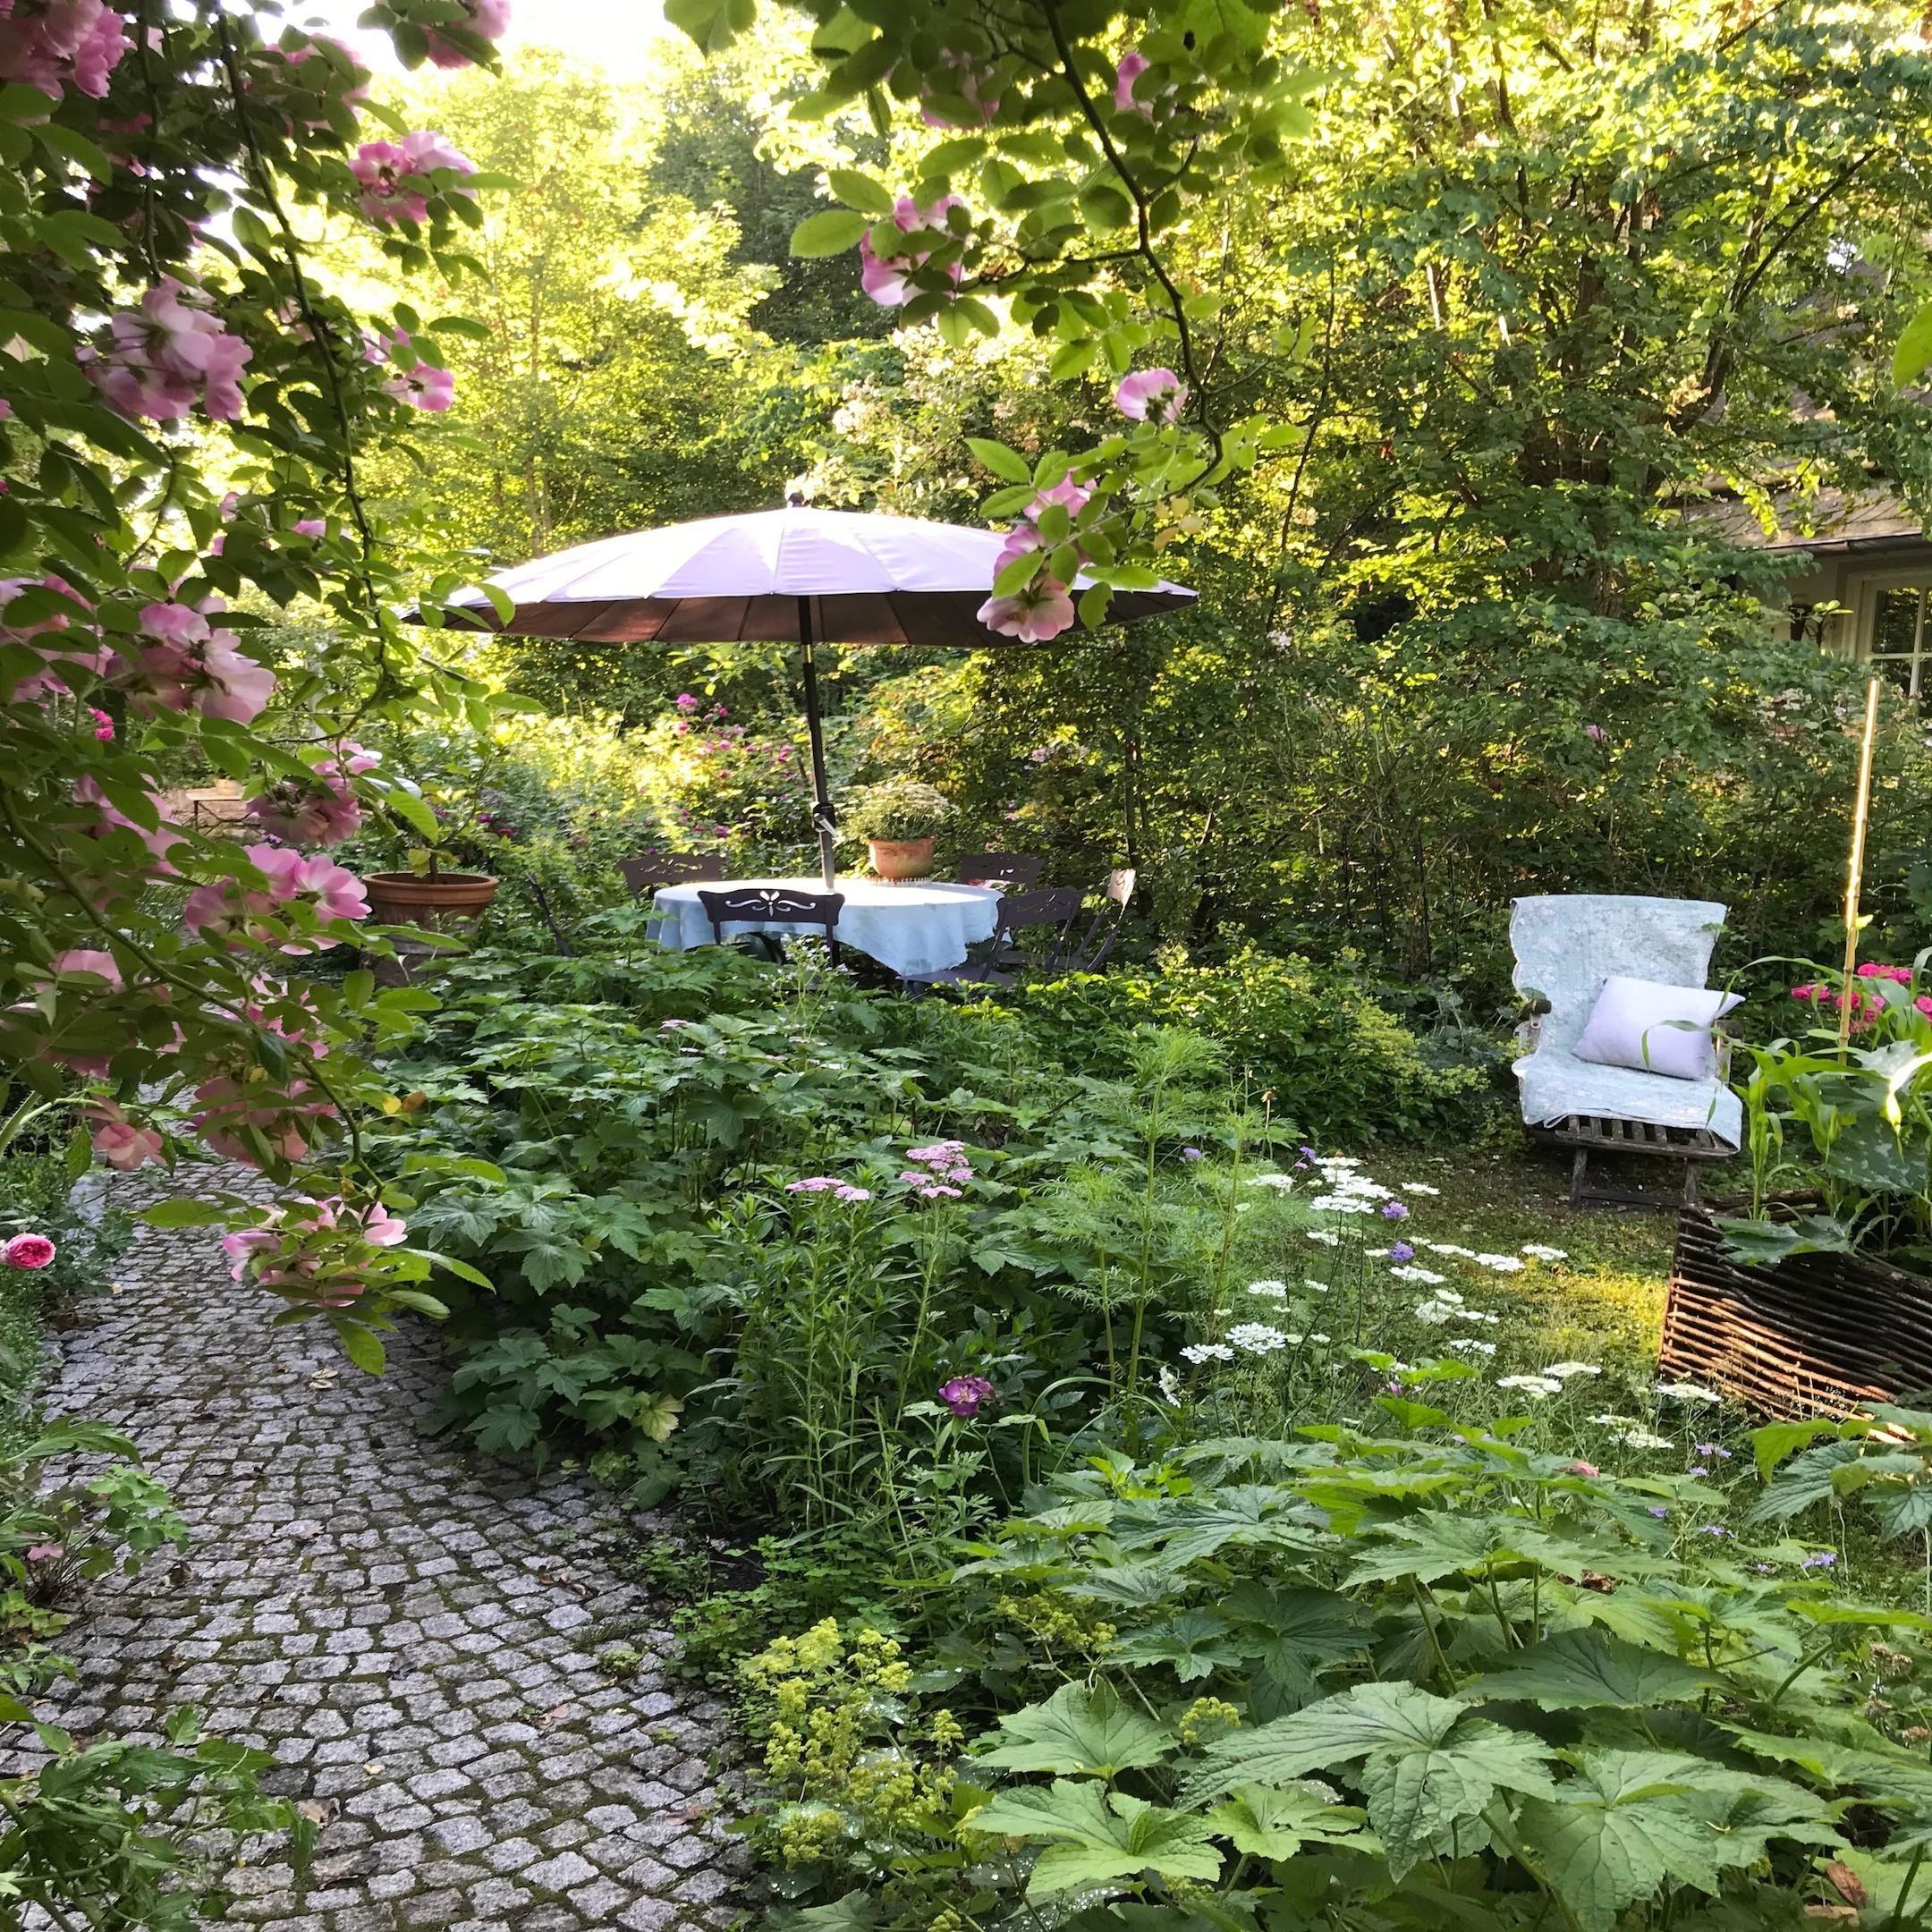 Lieblingspflanzen Blumen Fur Garten Cottage Garten Gruner Garten